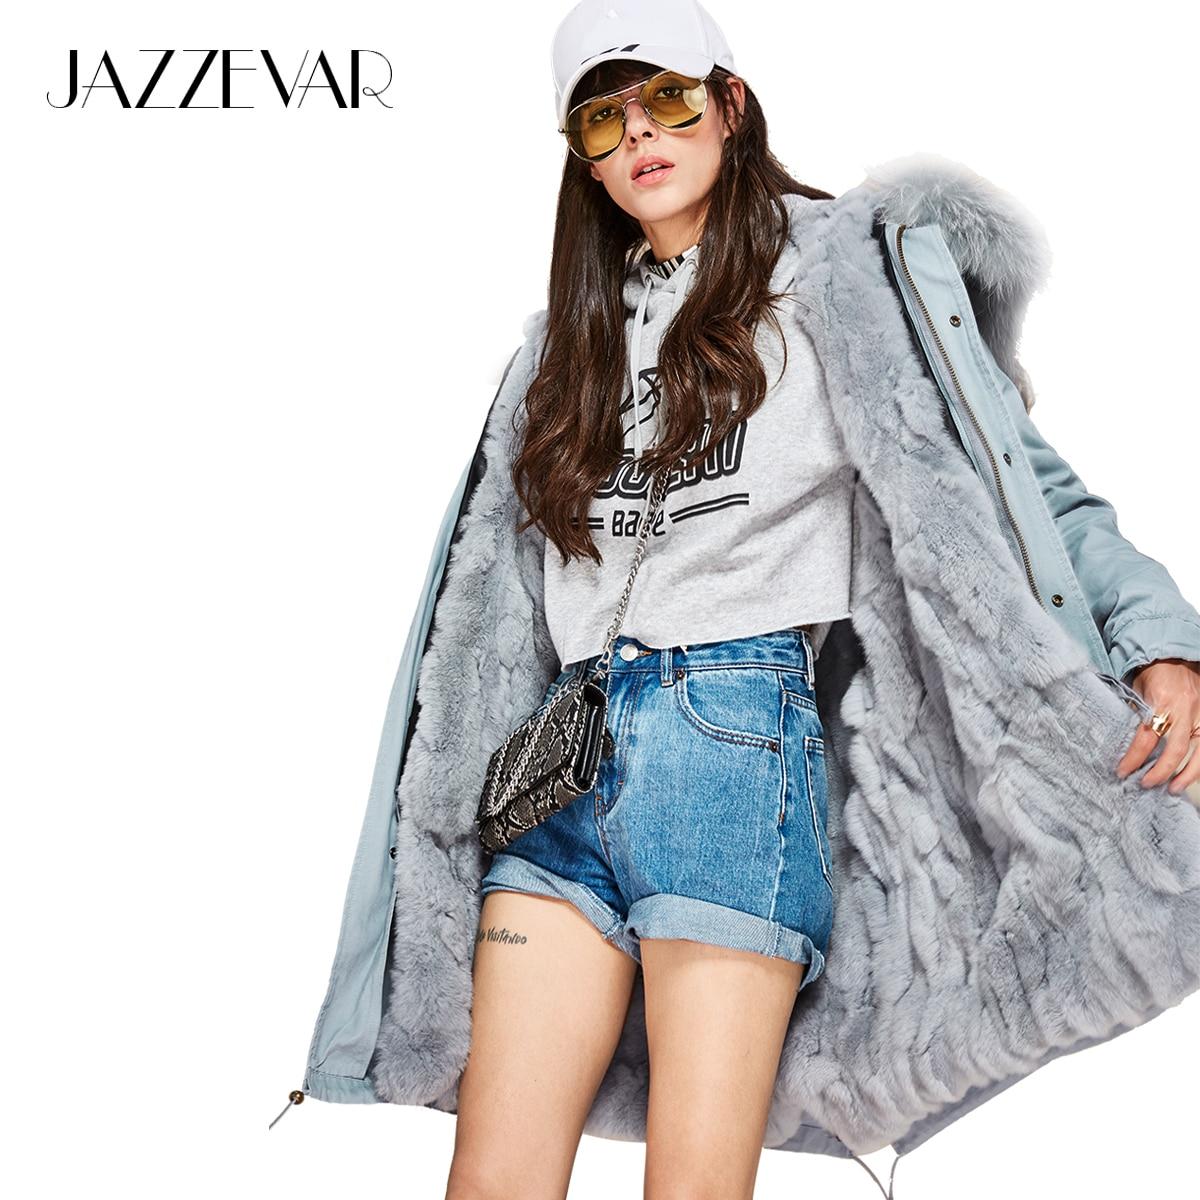 JAZZEVAR 2019 New women Large raccoon fur collar   parka   Midi hooded Military coat outwear rabbit fur lining winter jacket